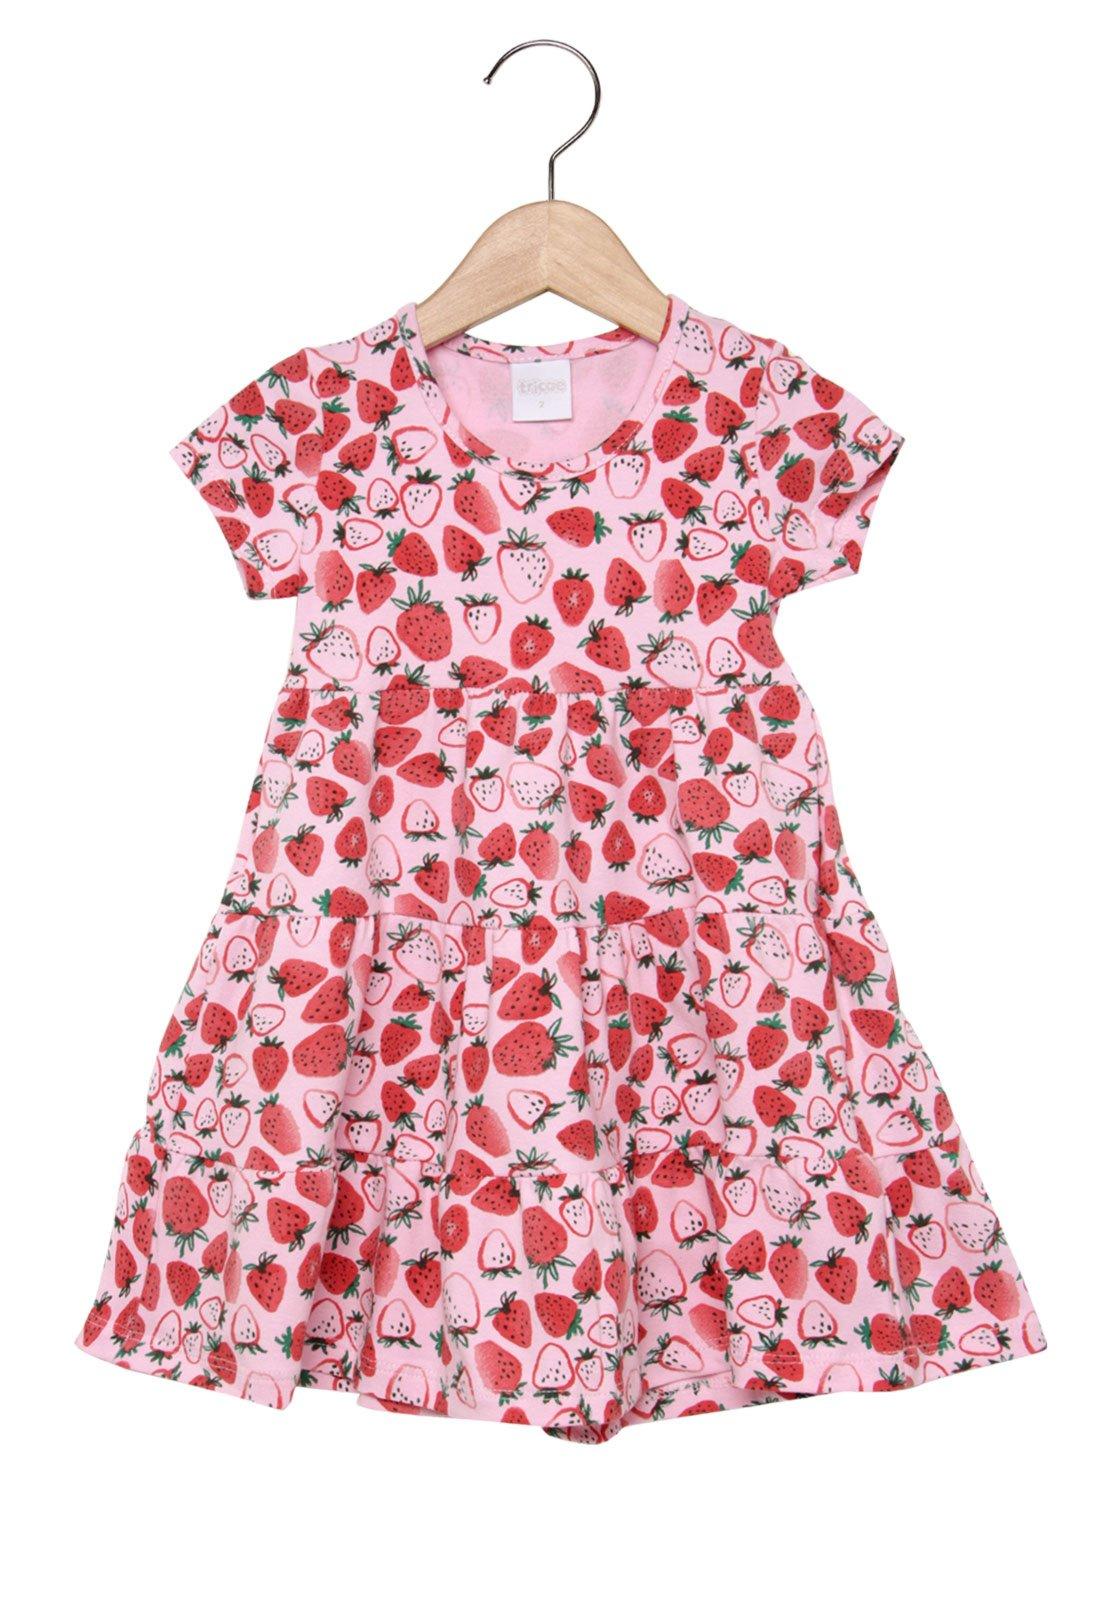 dc800f1740bac5 Vestido Infantil Tricae Morangos Rosa